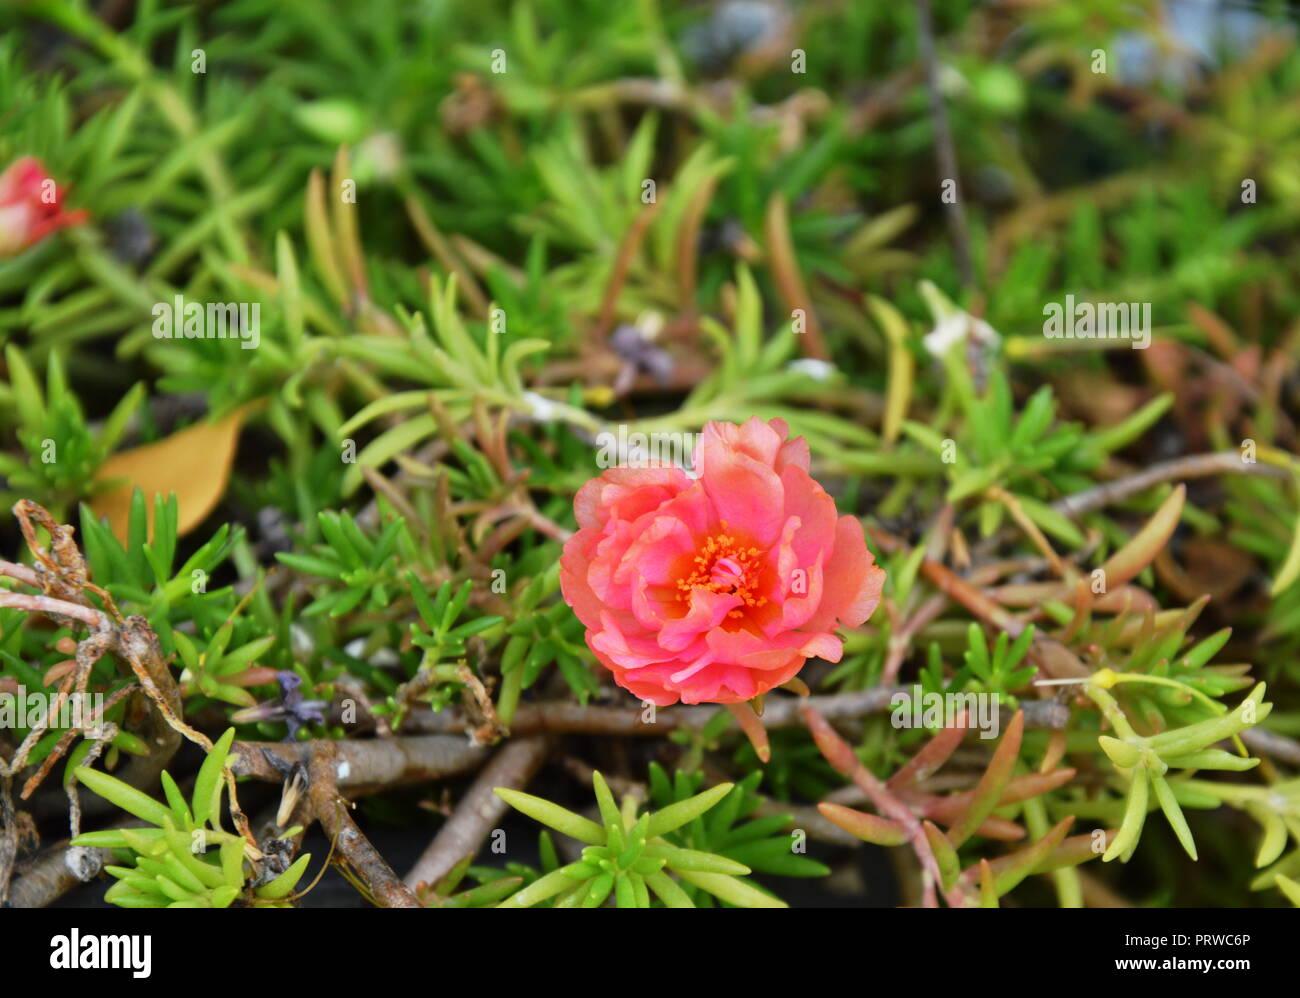 Rose Moos Im Garten Stockfoto Bild 221219902 Alamy